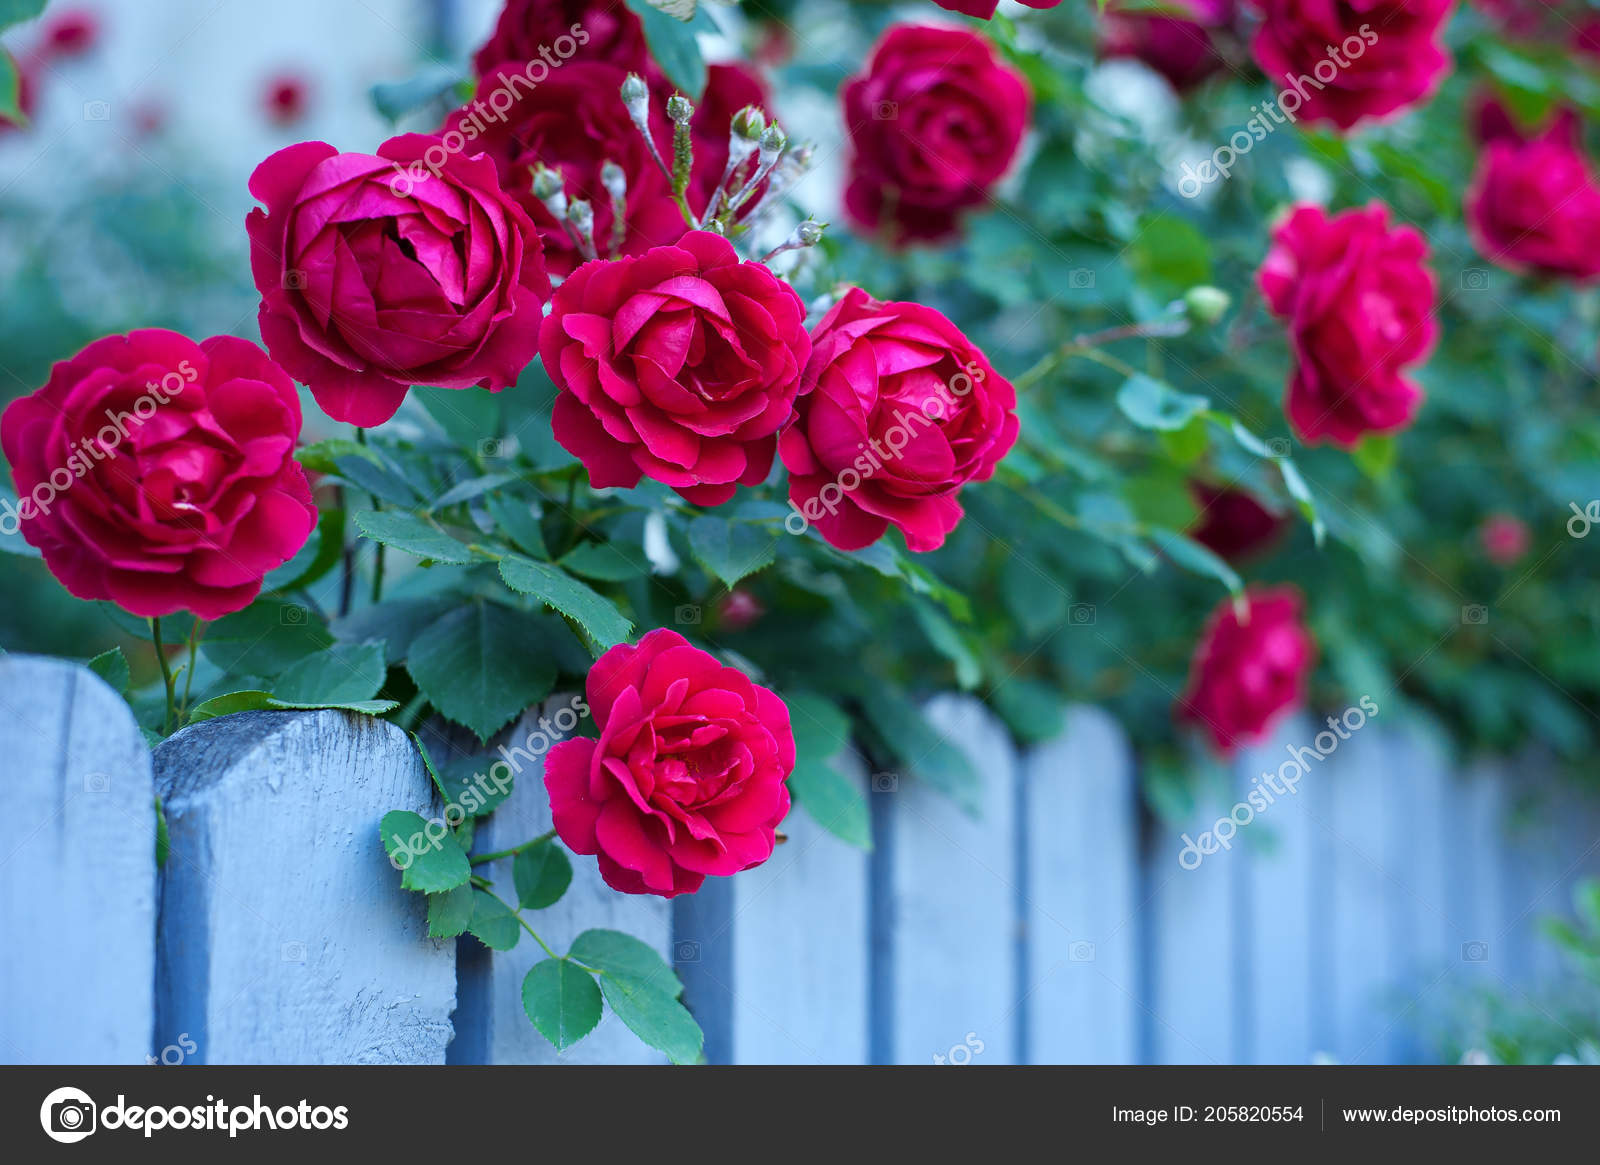 Rose rosse su sfondo verde